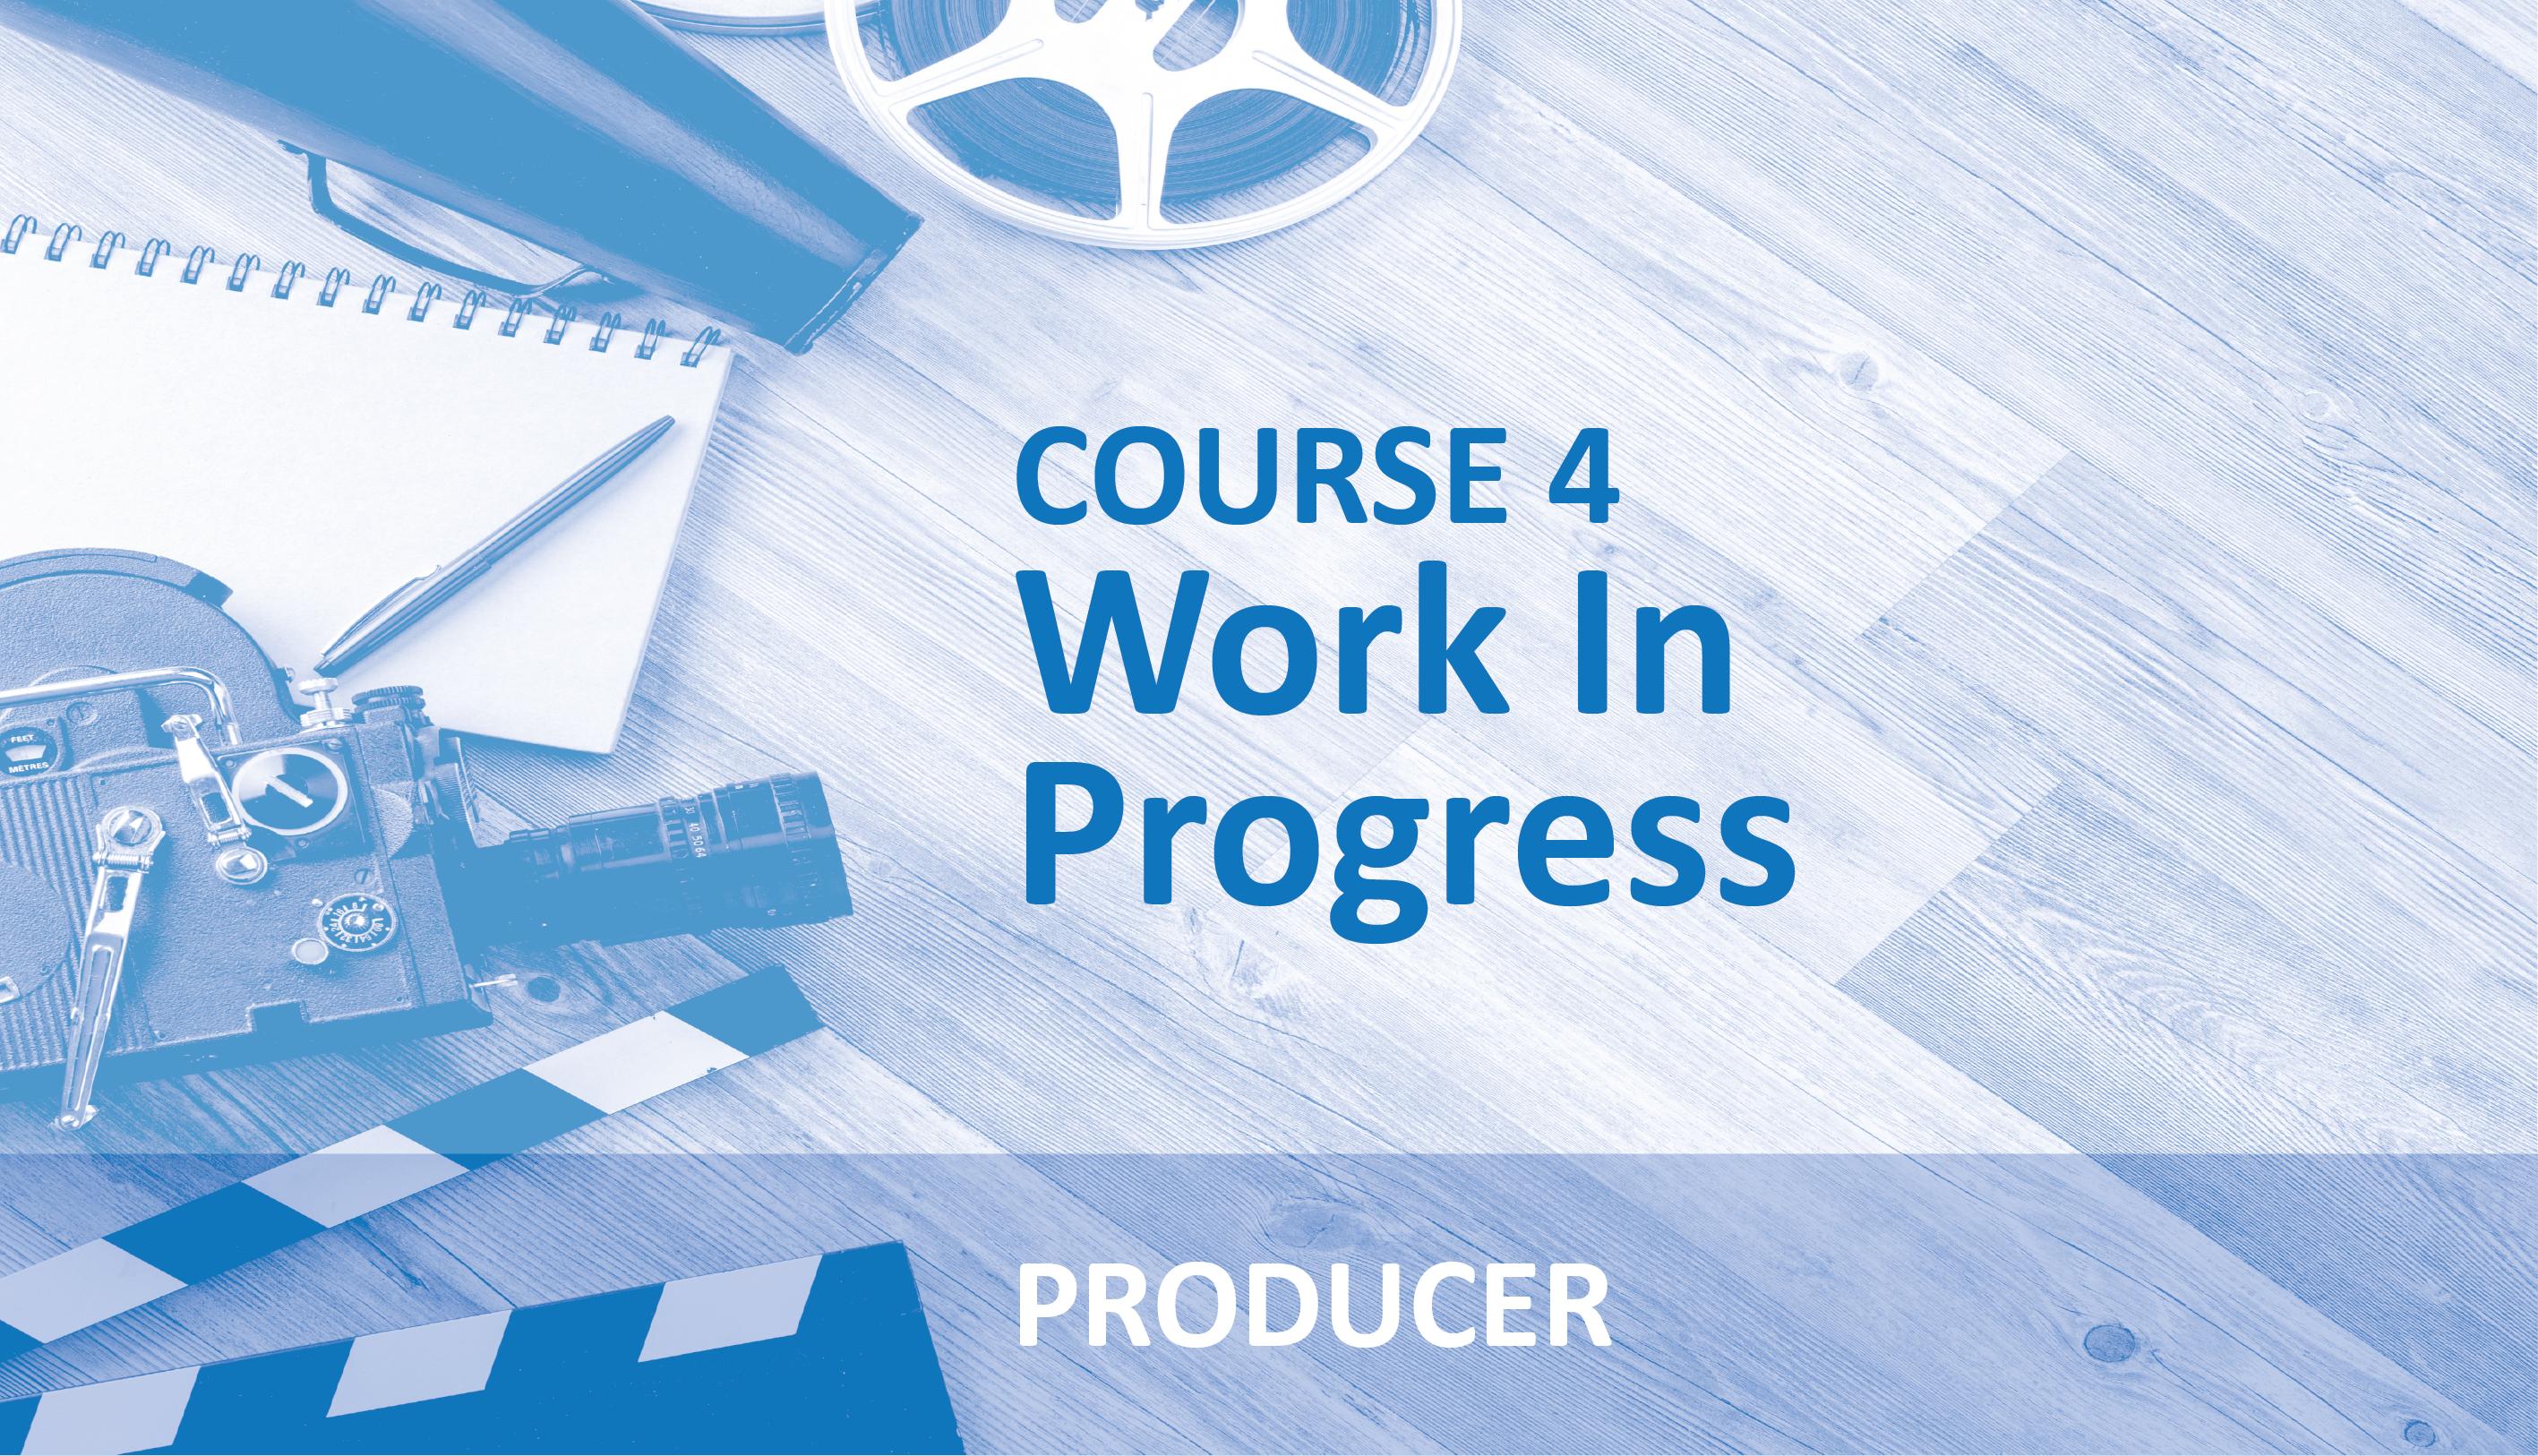 Work in Progress (Placeholder)